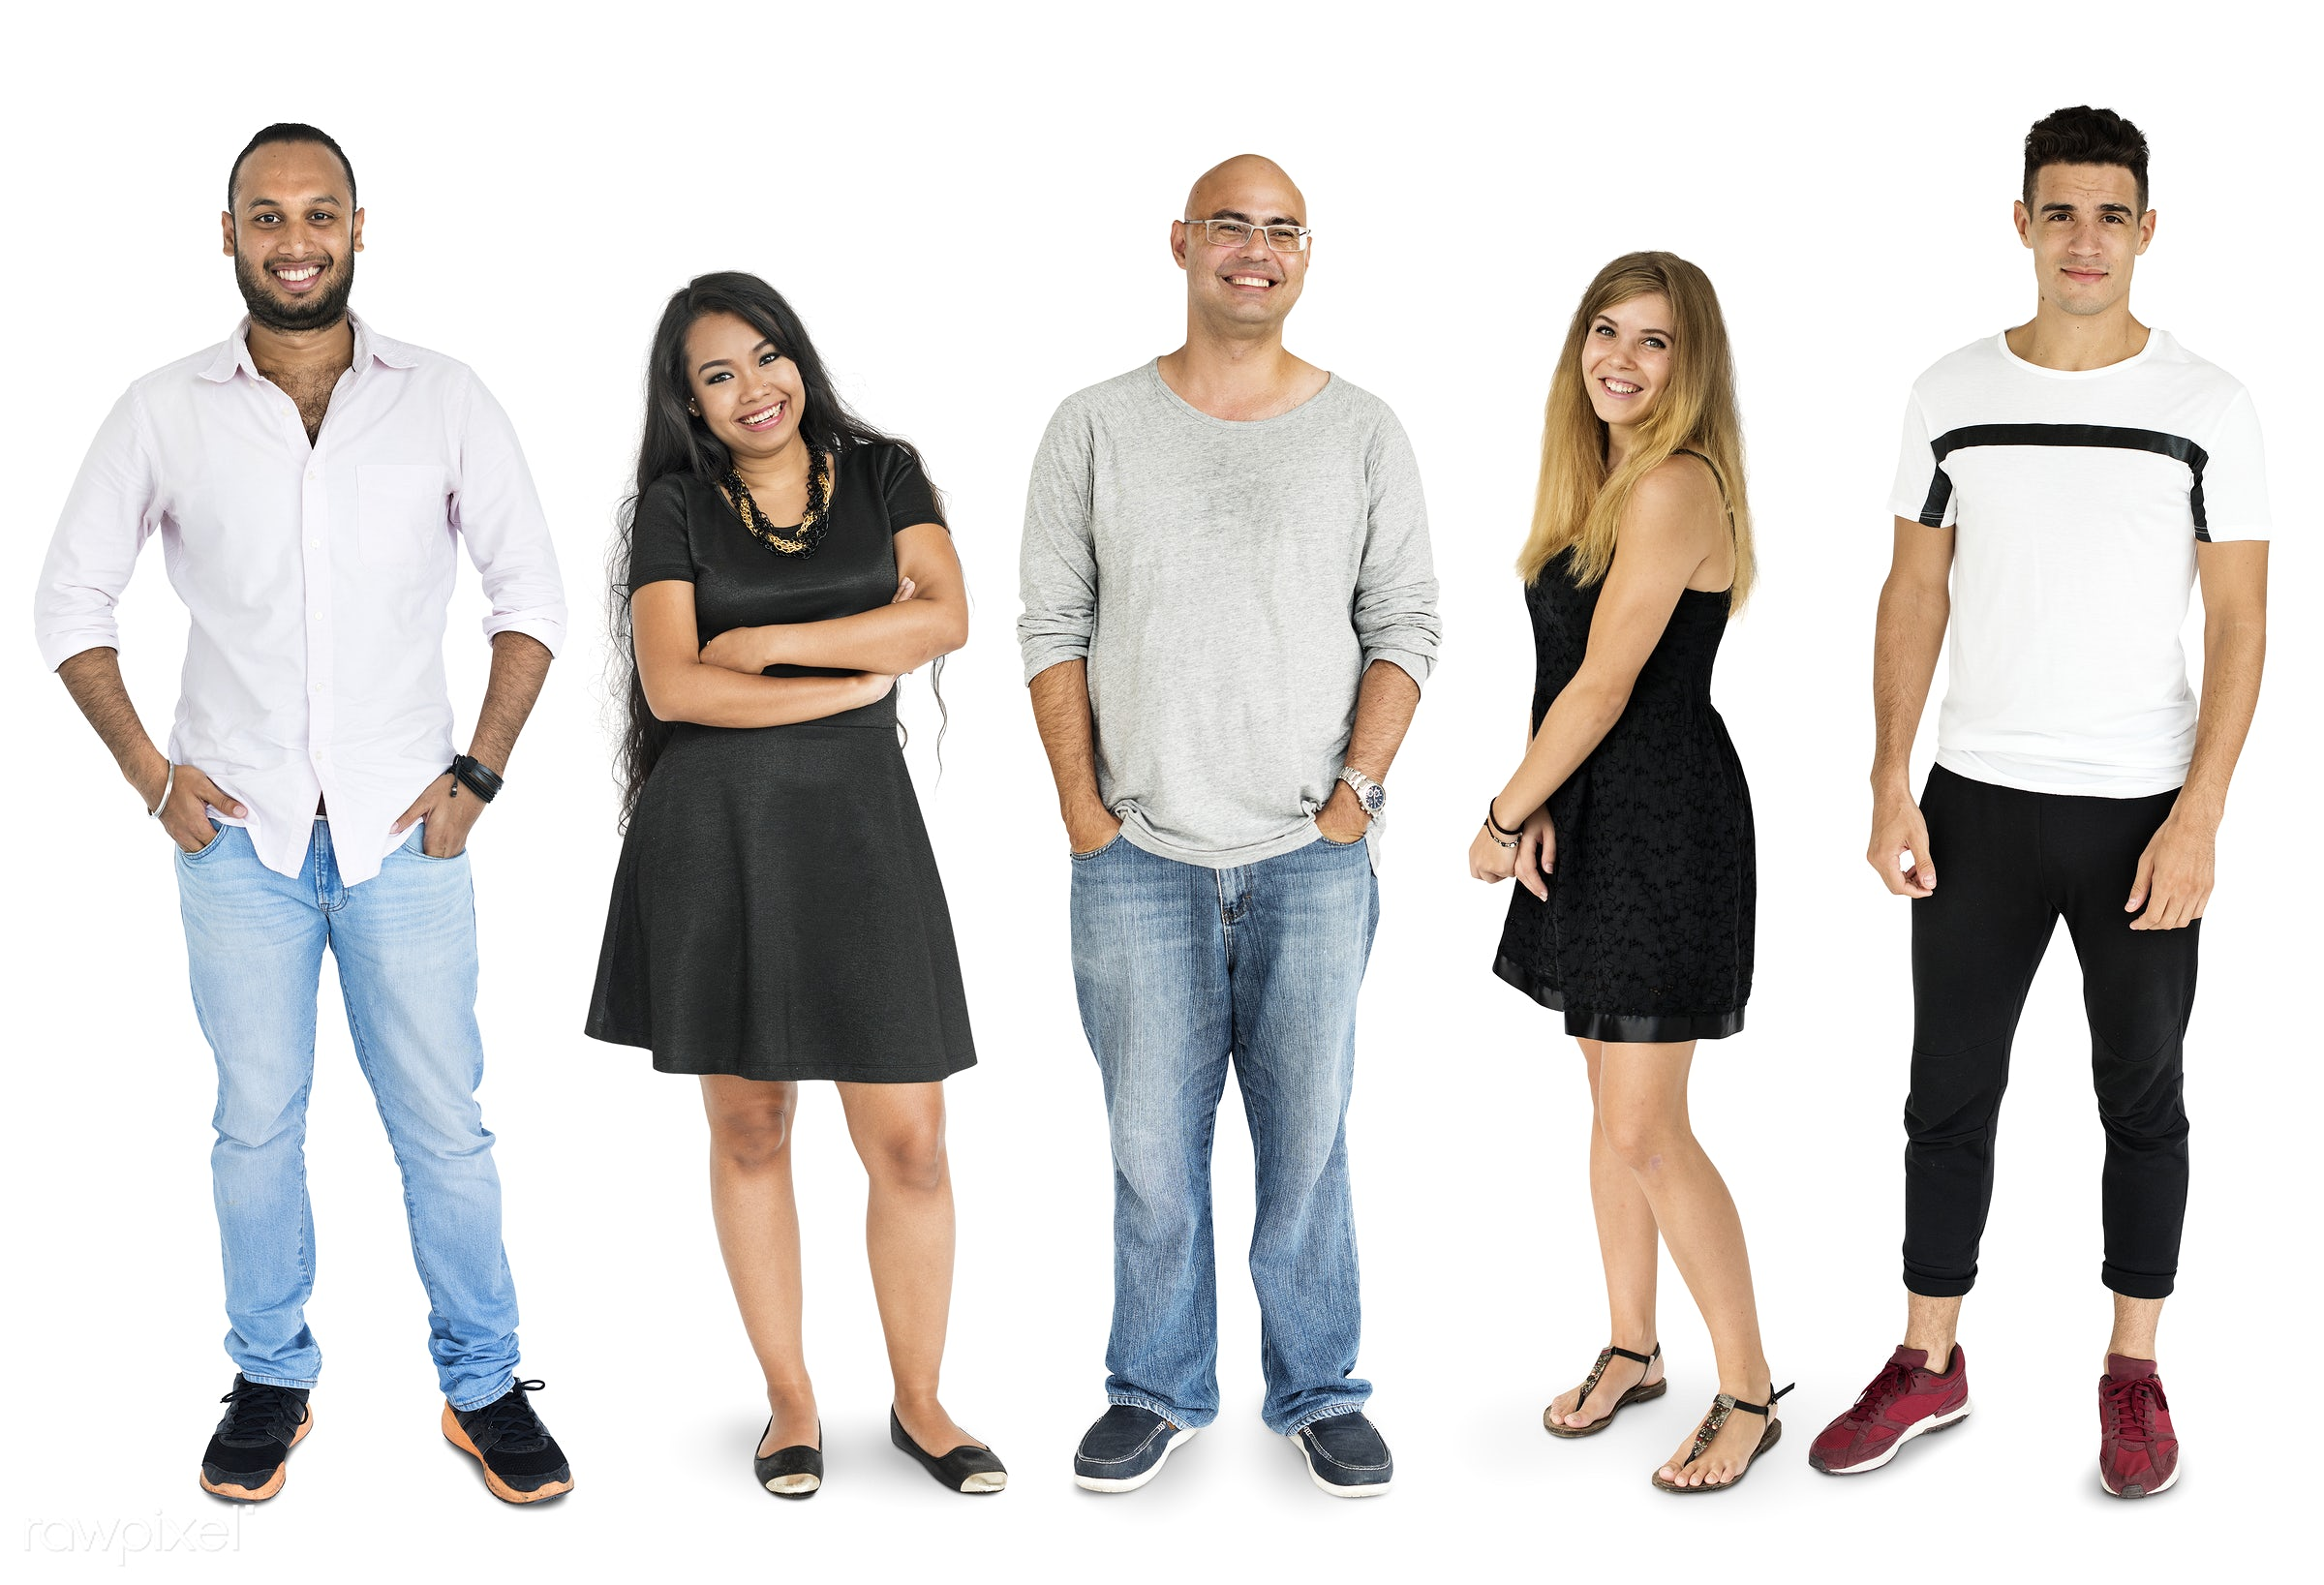 Diverse people set - gentlemen, studio, person, diverse, set, people, attraction, together, asian, caucasian, life, woman,...